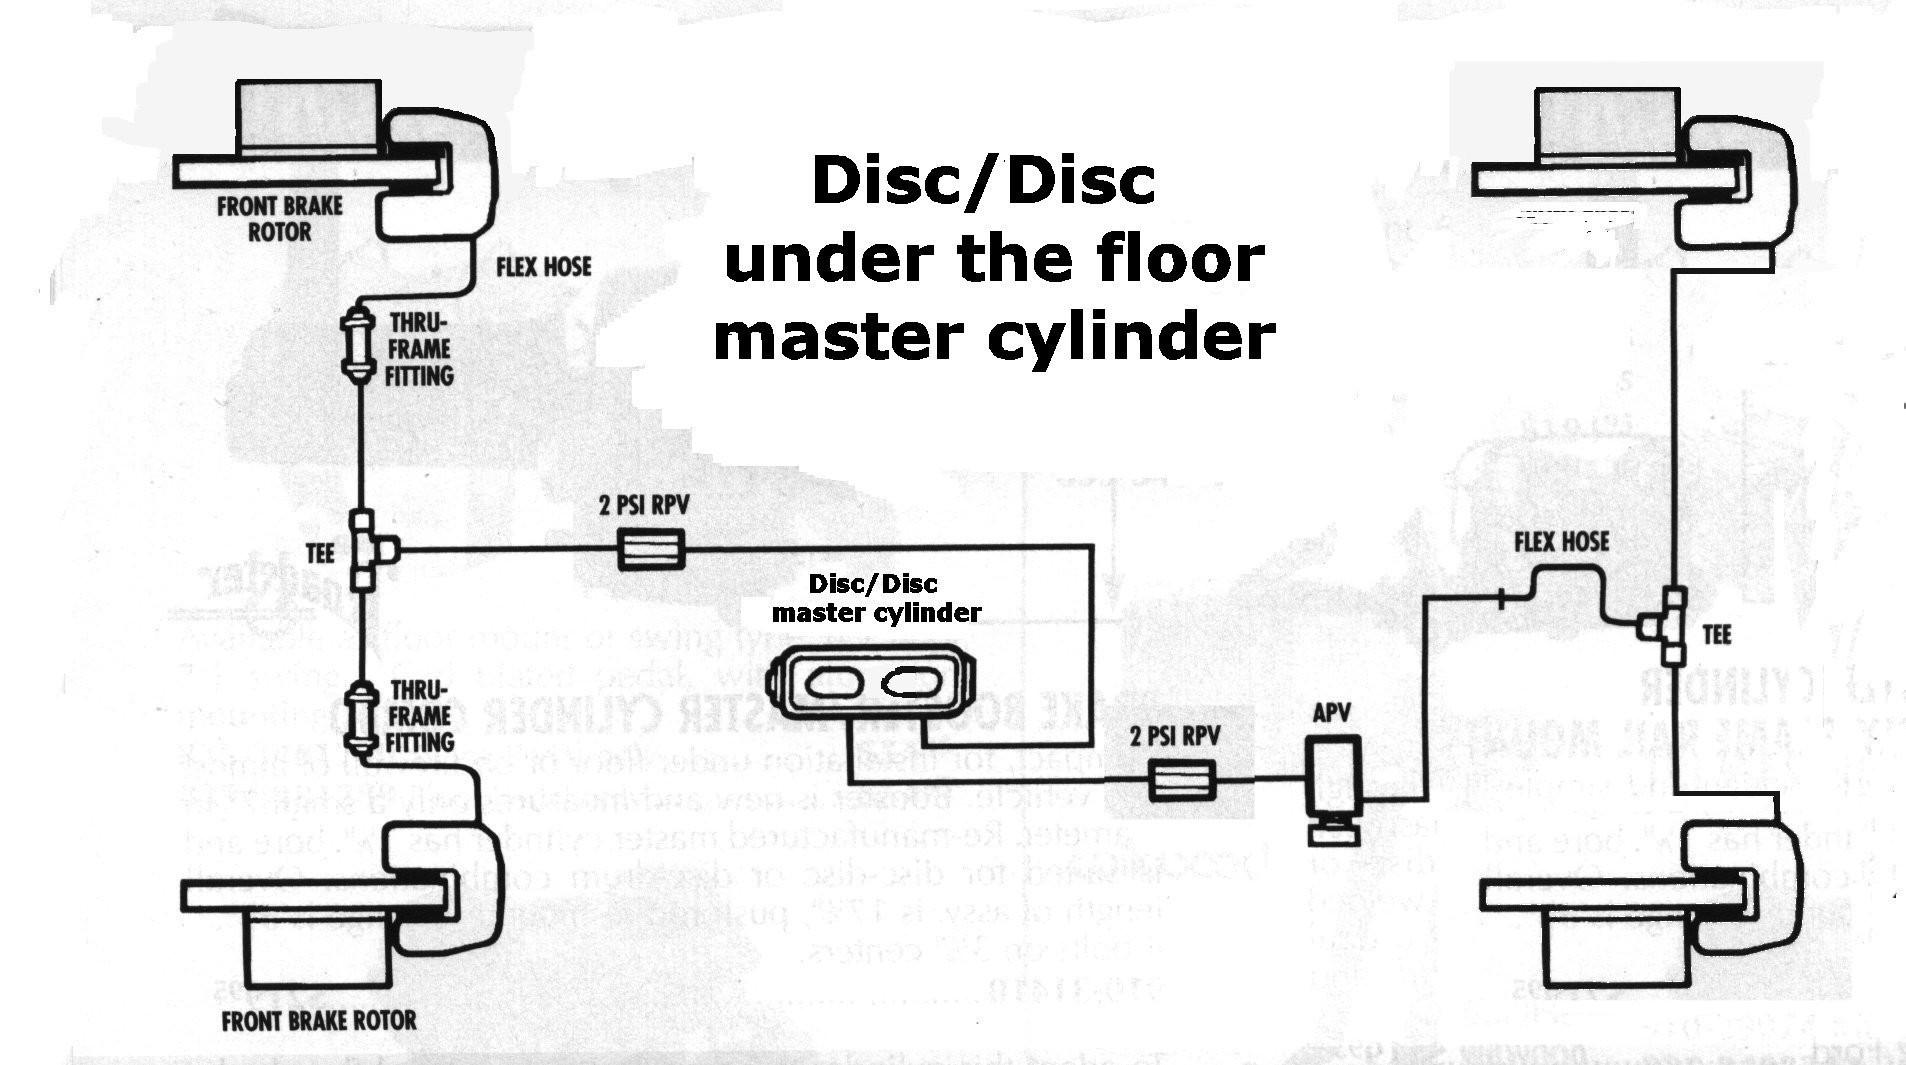 Gm Proportioning Valve Diagram Brake Line Diagram Hot Rod forum Hotrodders Bulletin Board Of Gm Proportioning Valve Diagram